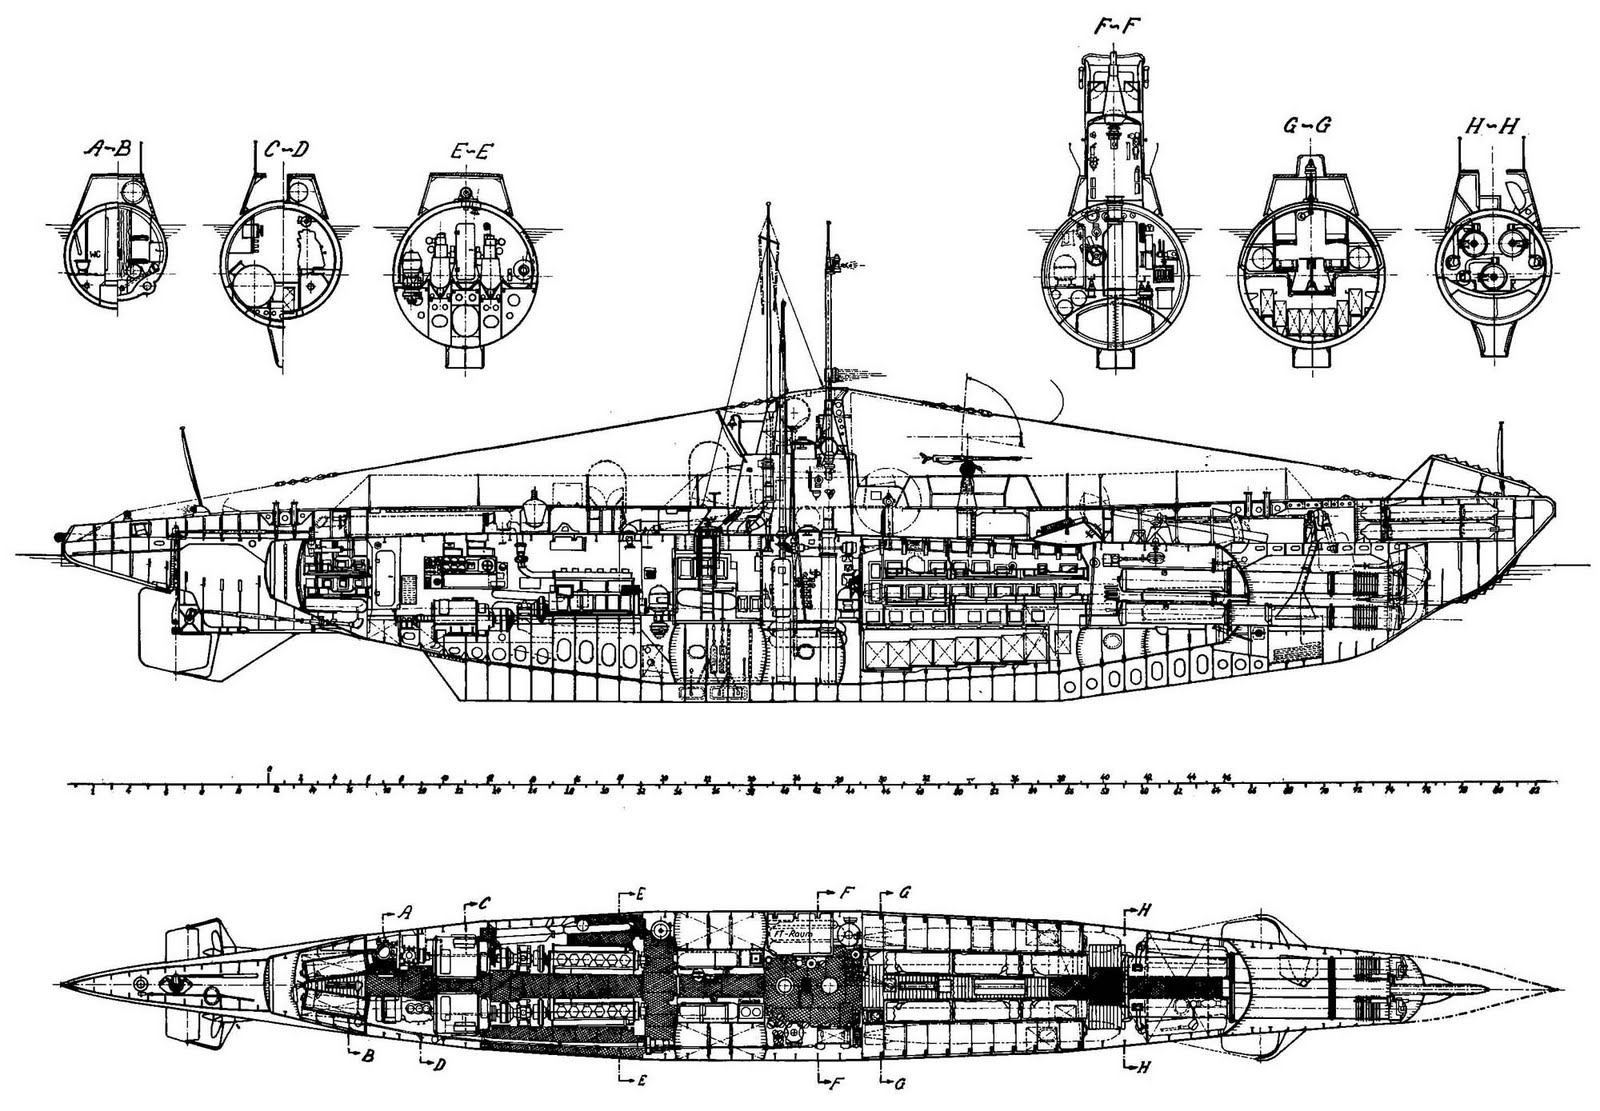 Cameron Anderson Architecture Qut Naval Architecture